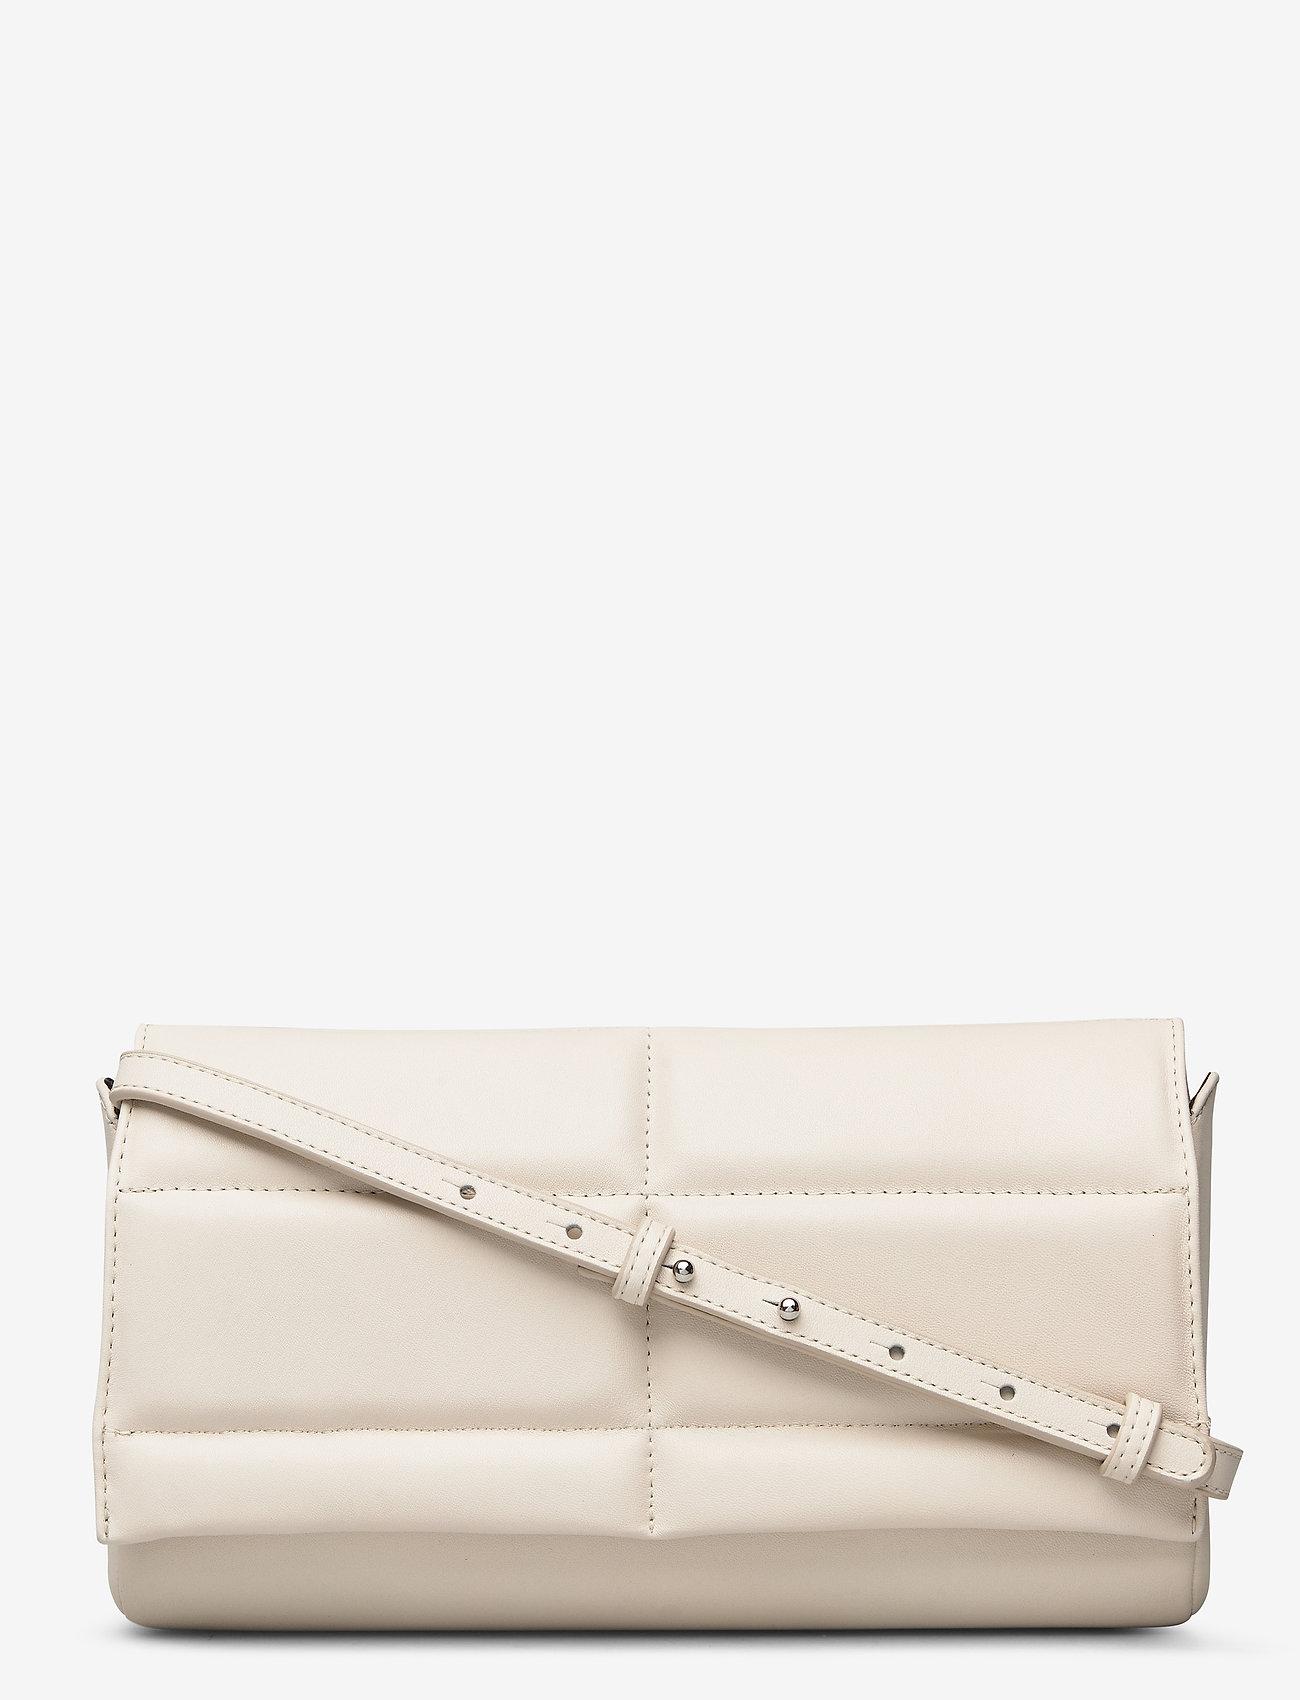 VAGABOND - MALIBU - crossbody bags - off white - 0